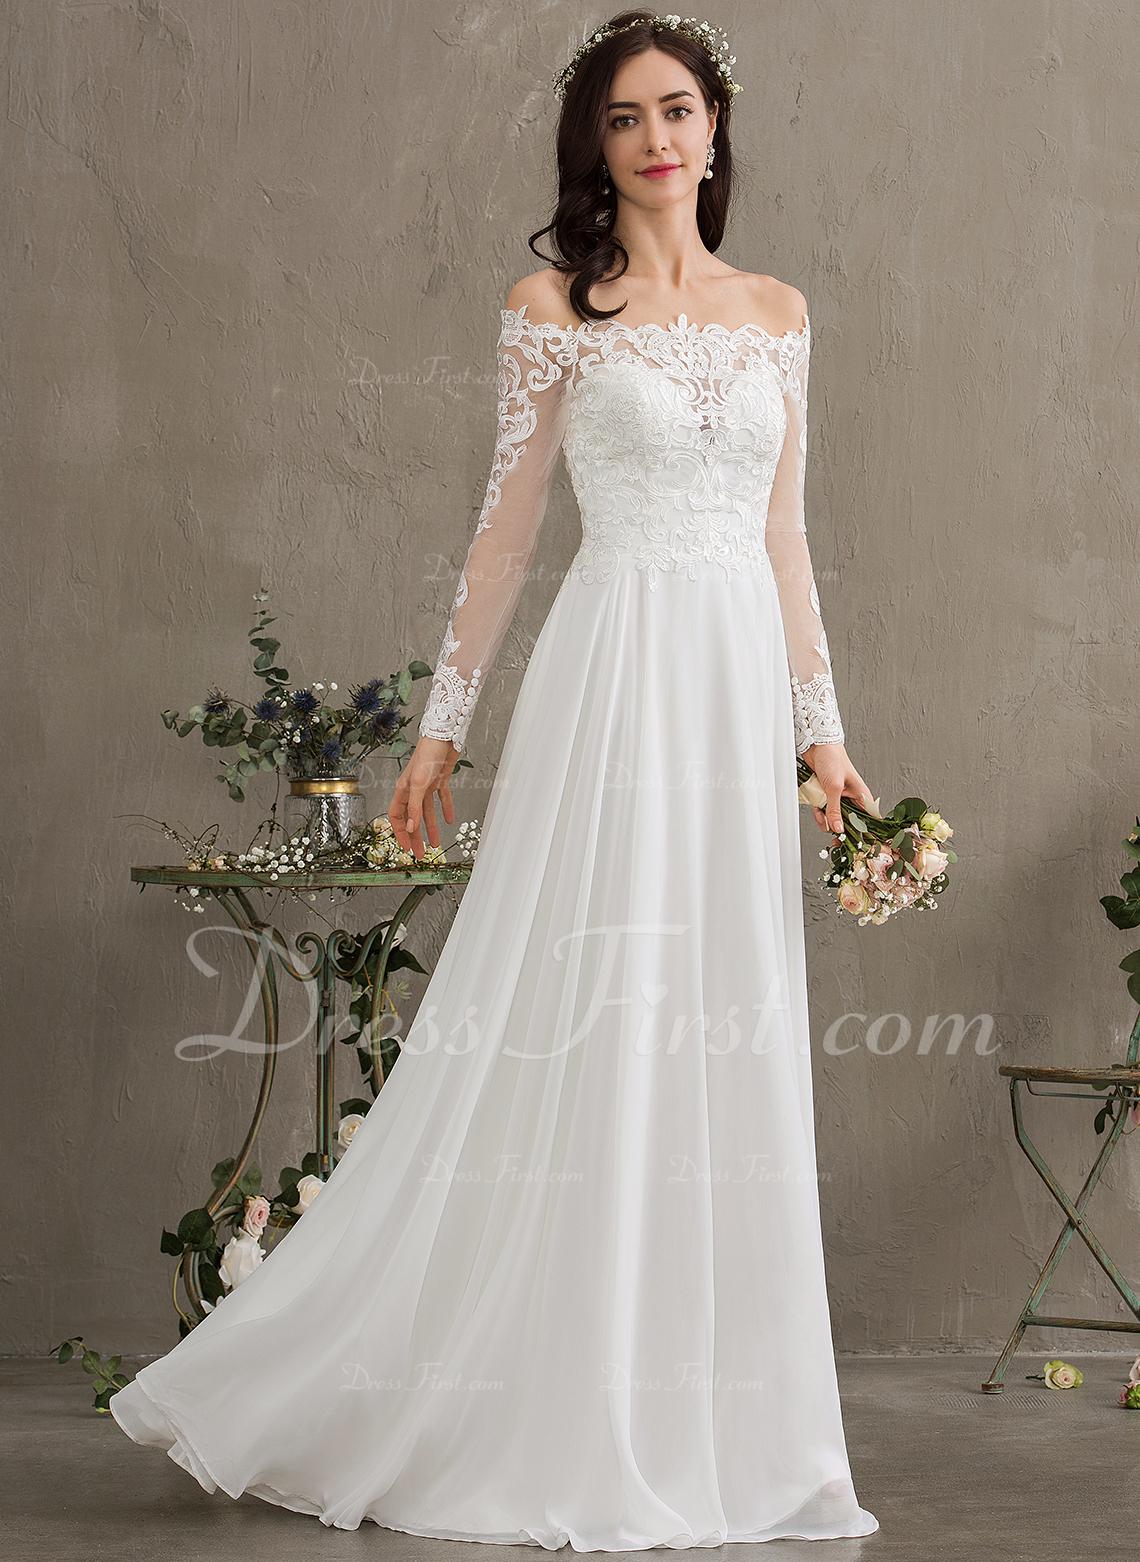 A-Line Off-the-Shoulder Floor-Length Chiffon Wedding Dress